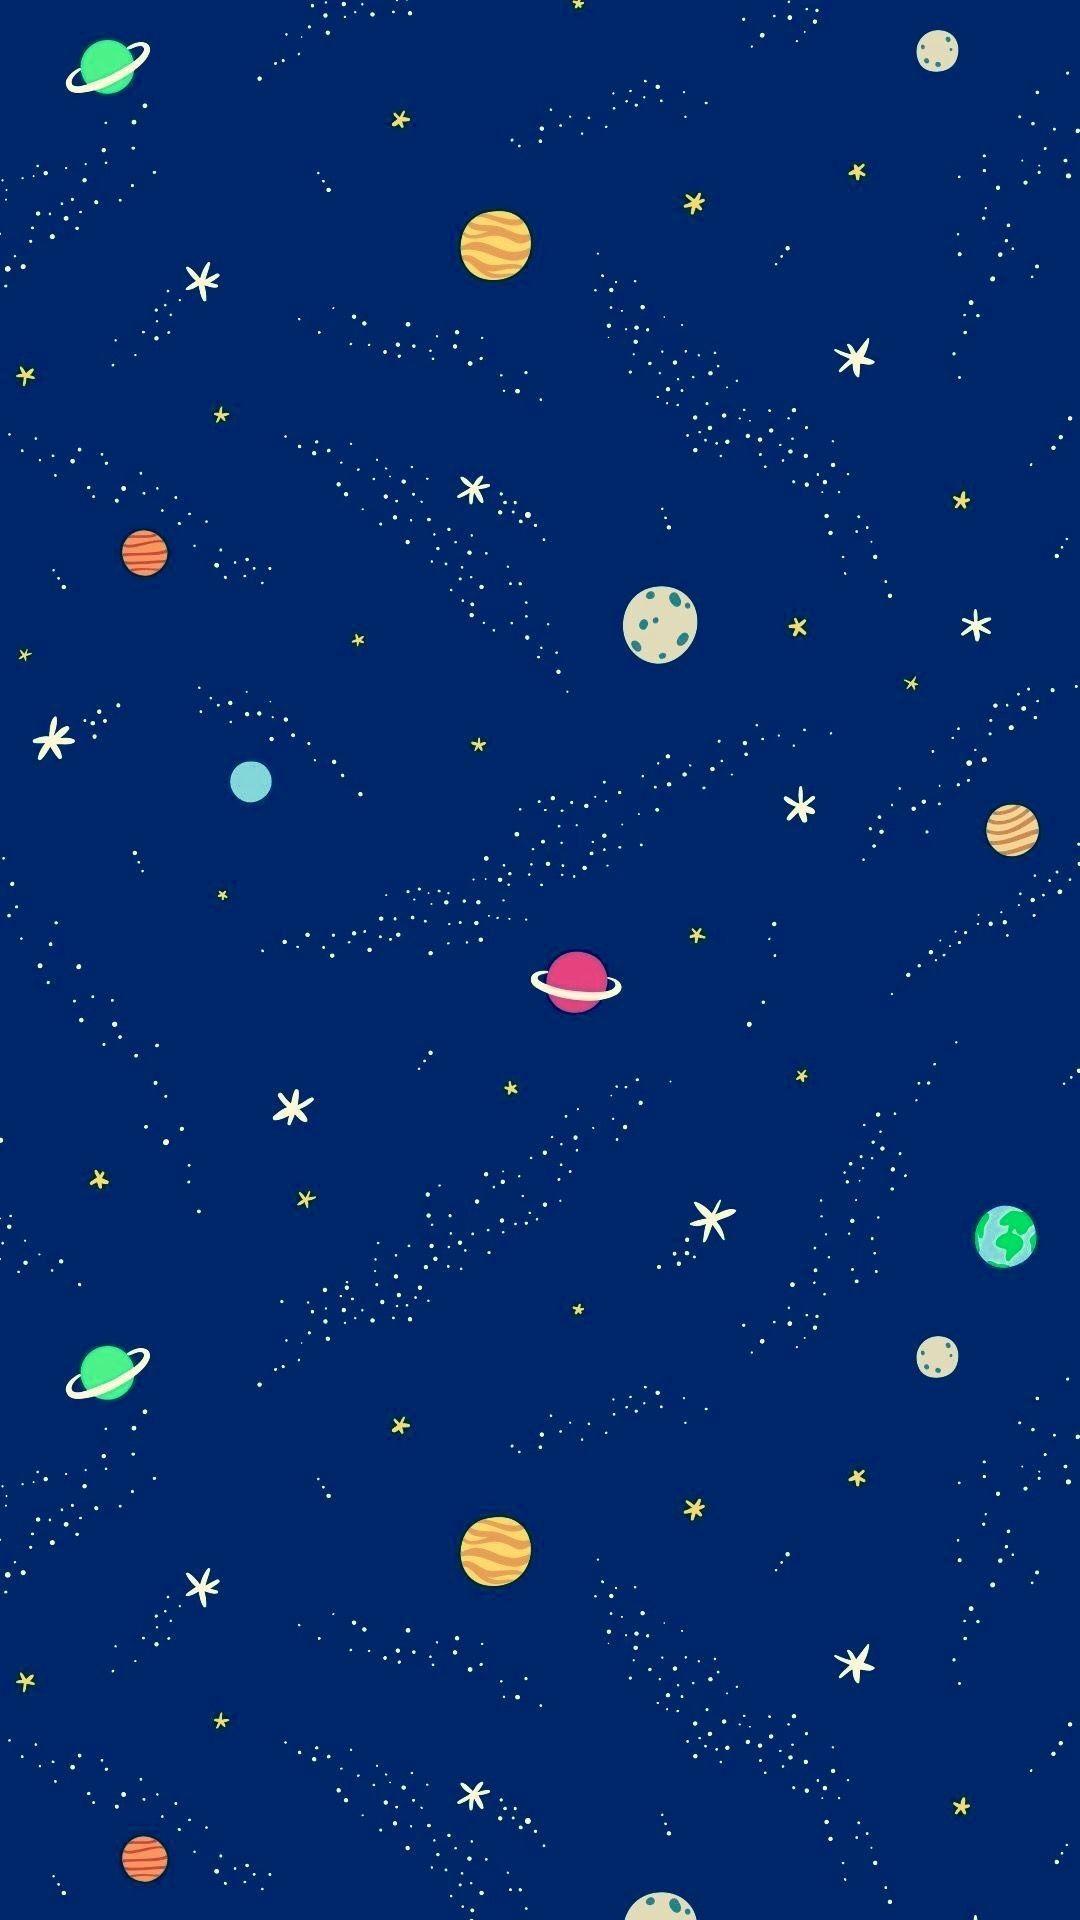 Aesthetic Moon Wallpaper Moon And Stars Wallpaper Space Themed Wallpaper Iphone Wallpaper Moon